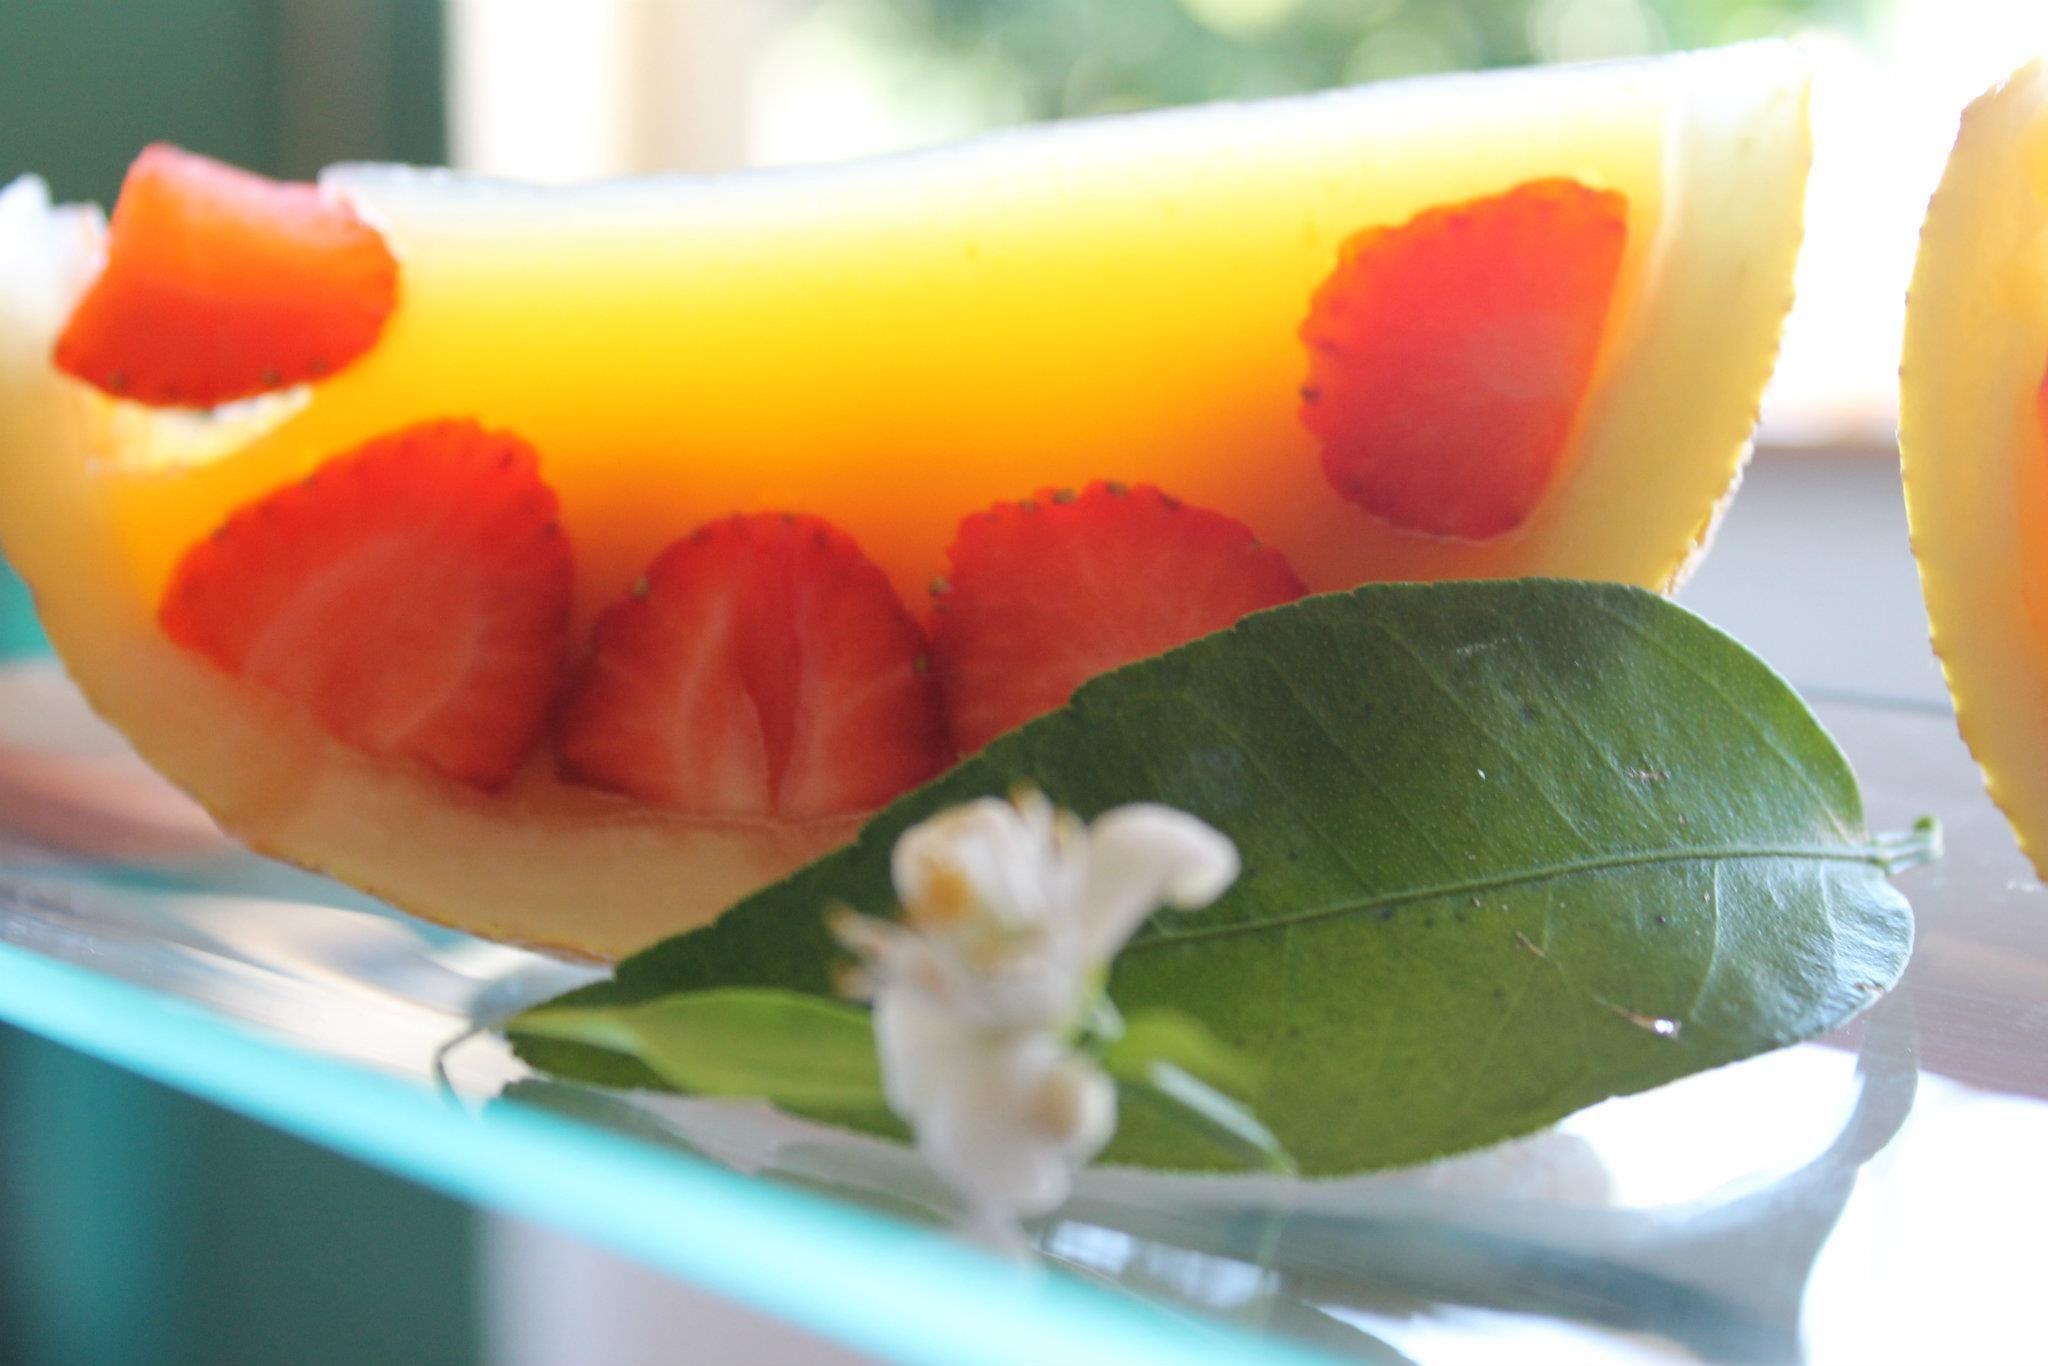 Melón de naranja y fresa